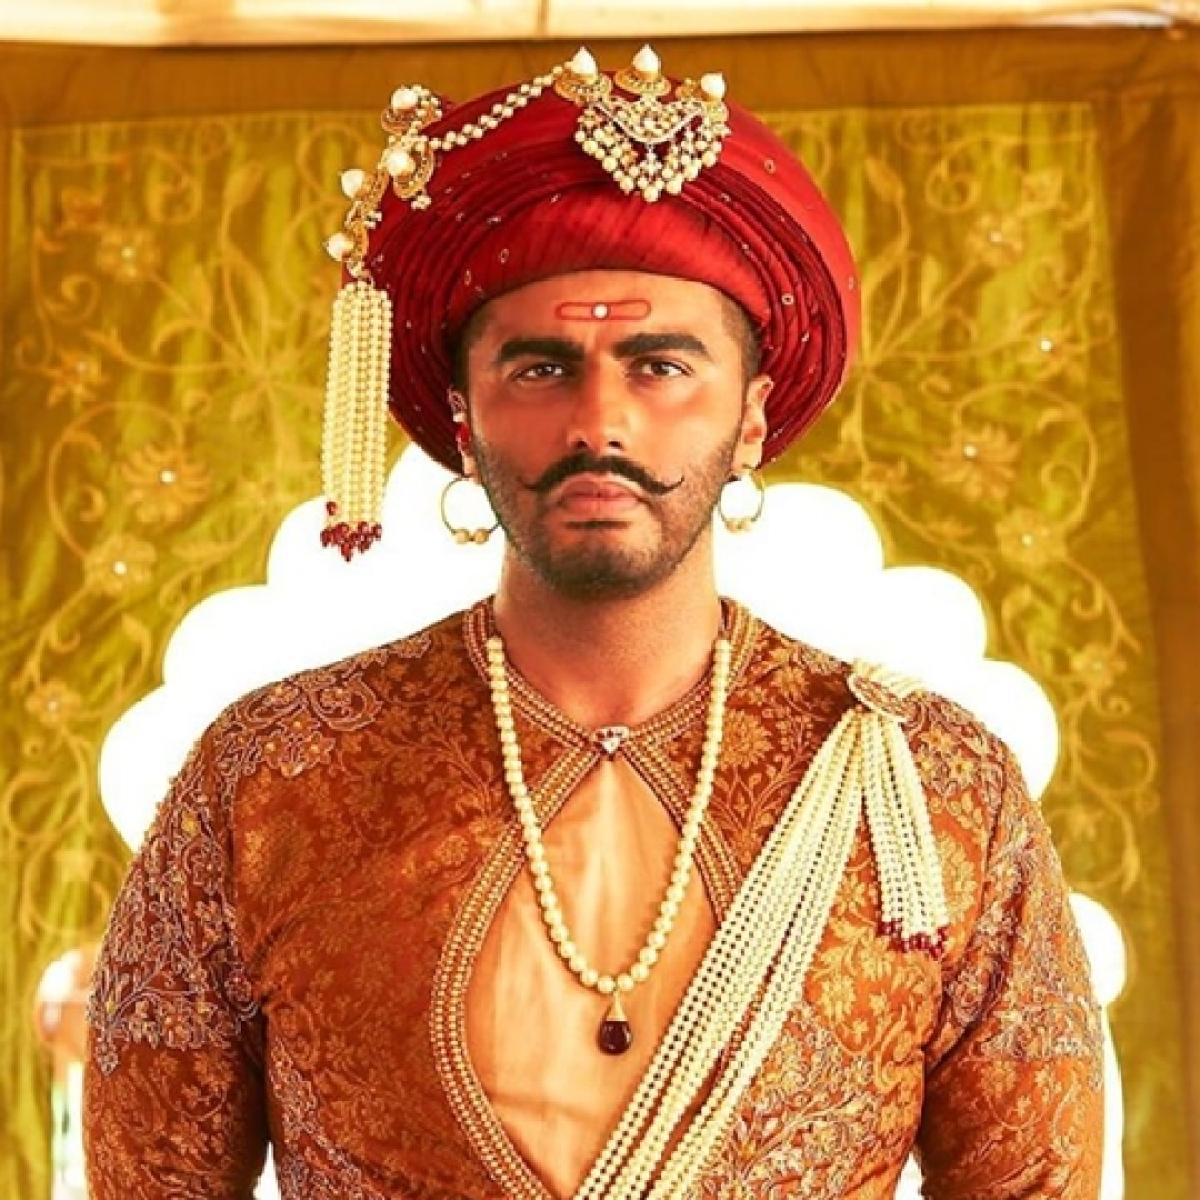 #BoycottPanipat trends after Jat ruler Maharaja Surajmal portrayed in an unseemly manner